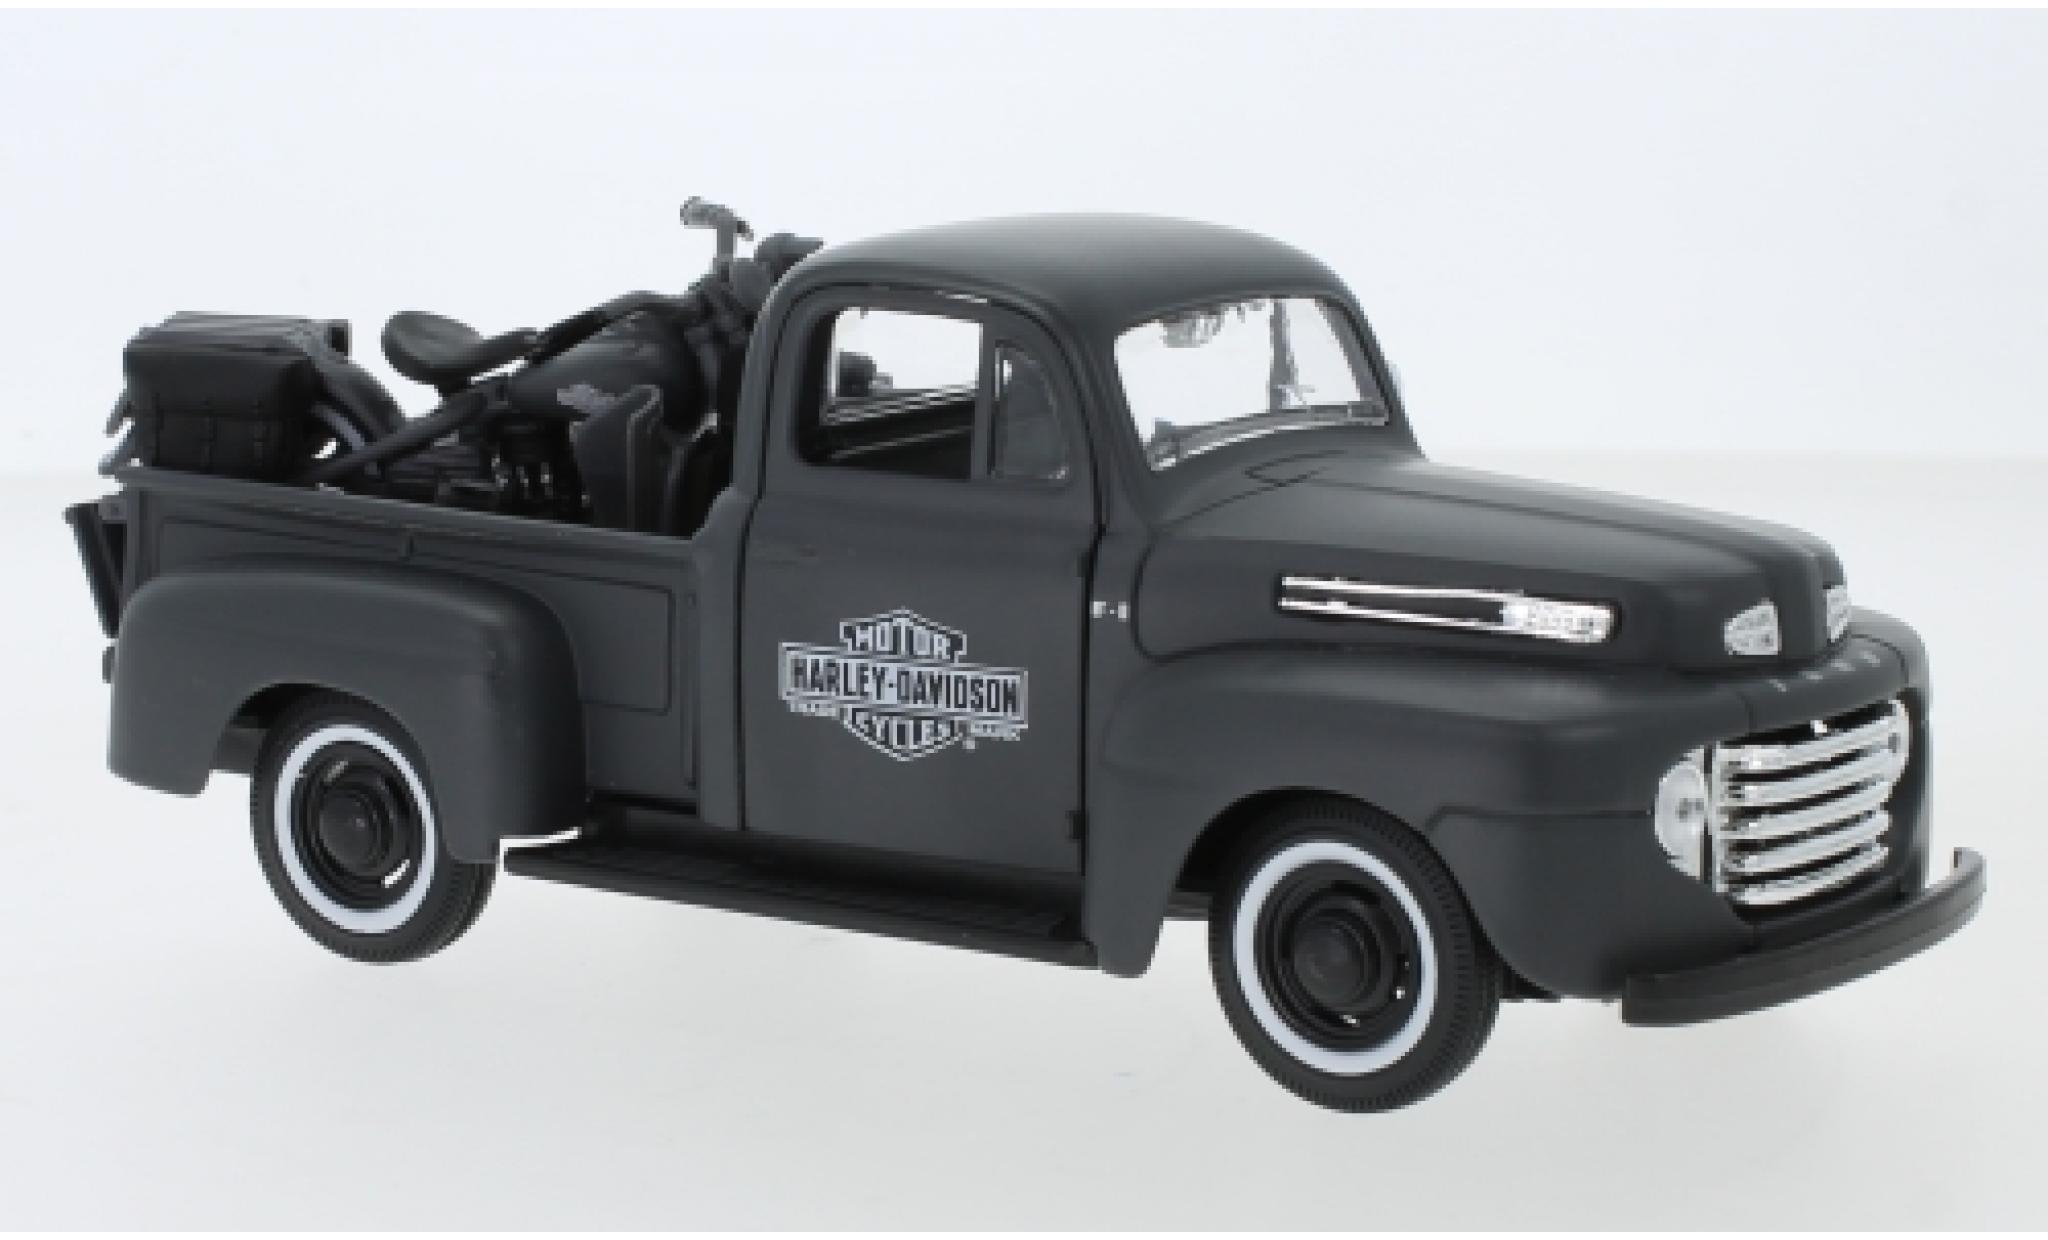 Ford F-1 1/24 Maisto Pick Up Tuning matt-grise/Dekor Harley-Davidson 1948 Maßstab ca. 1:25 mit 1942 Harley Davidson WLA Flathead